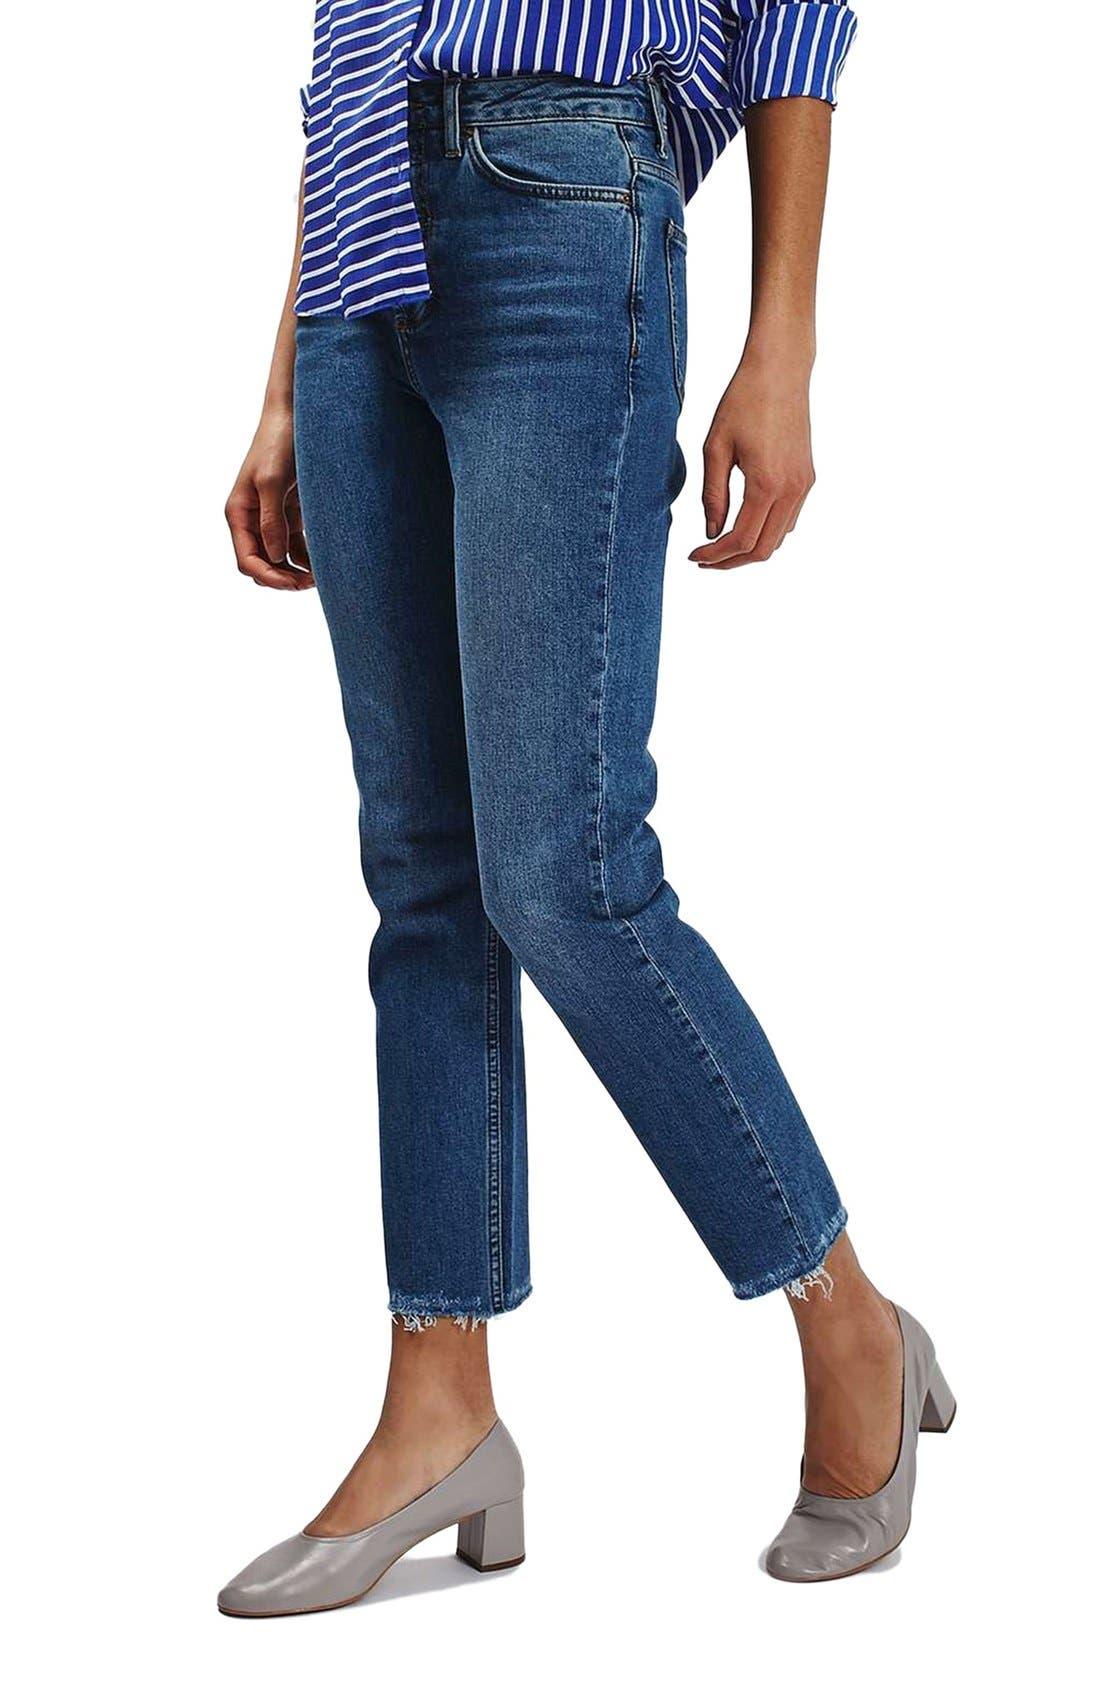 TOPSHOP, Raw Hem Straight Leg Jeans, Main thumbnail 1, color, 401